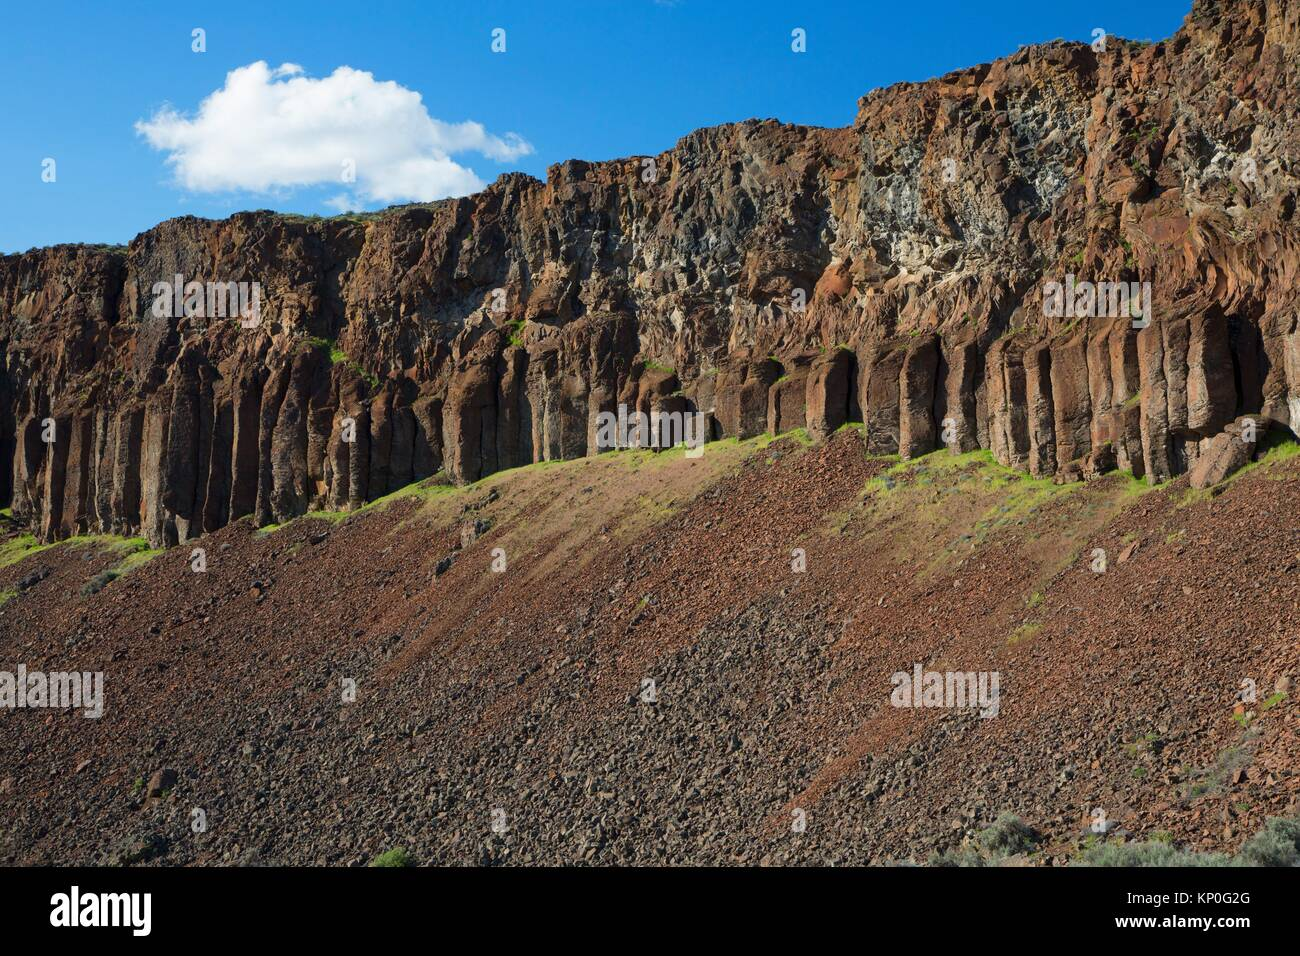 Basalt Stone Umpqua National Forest : Columnar stock photos images alamy